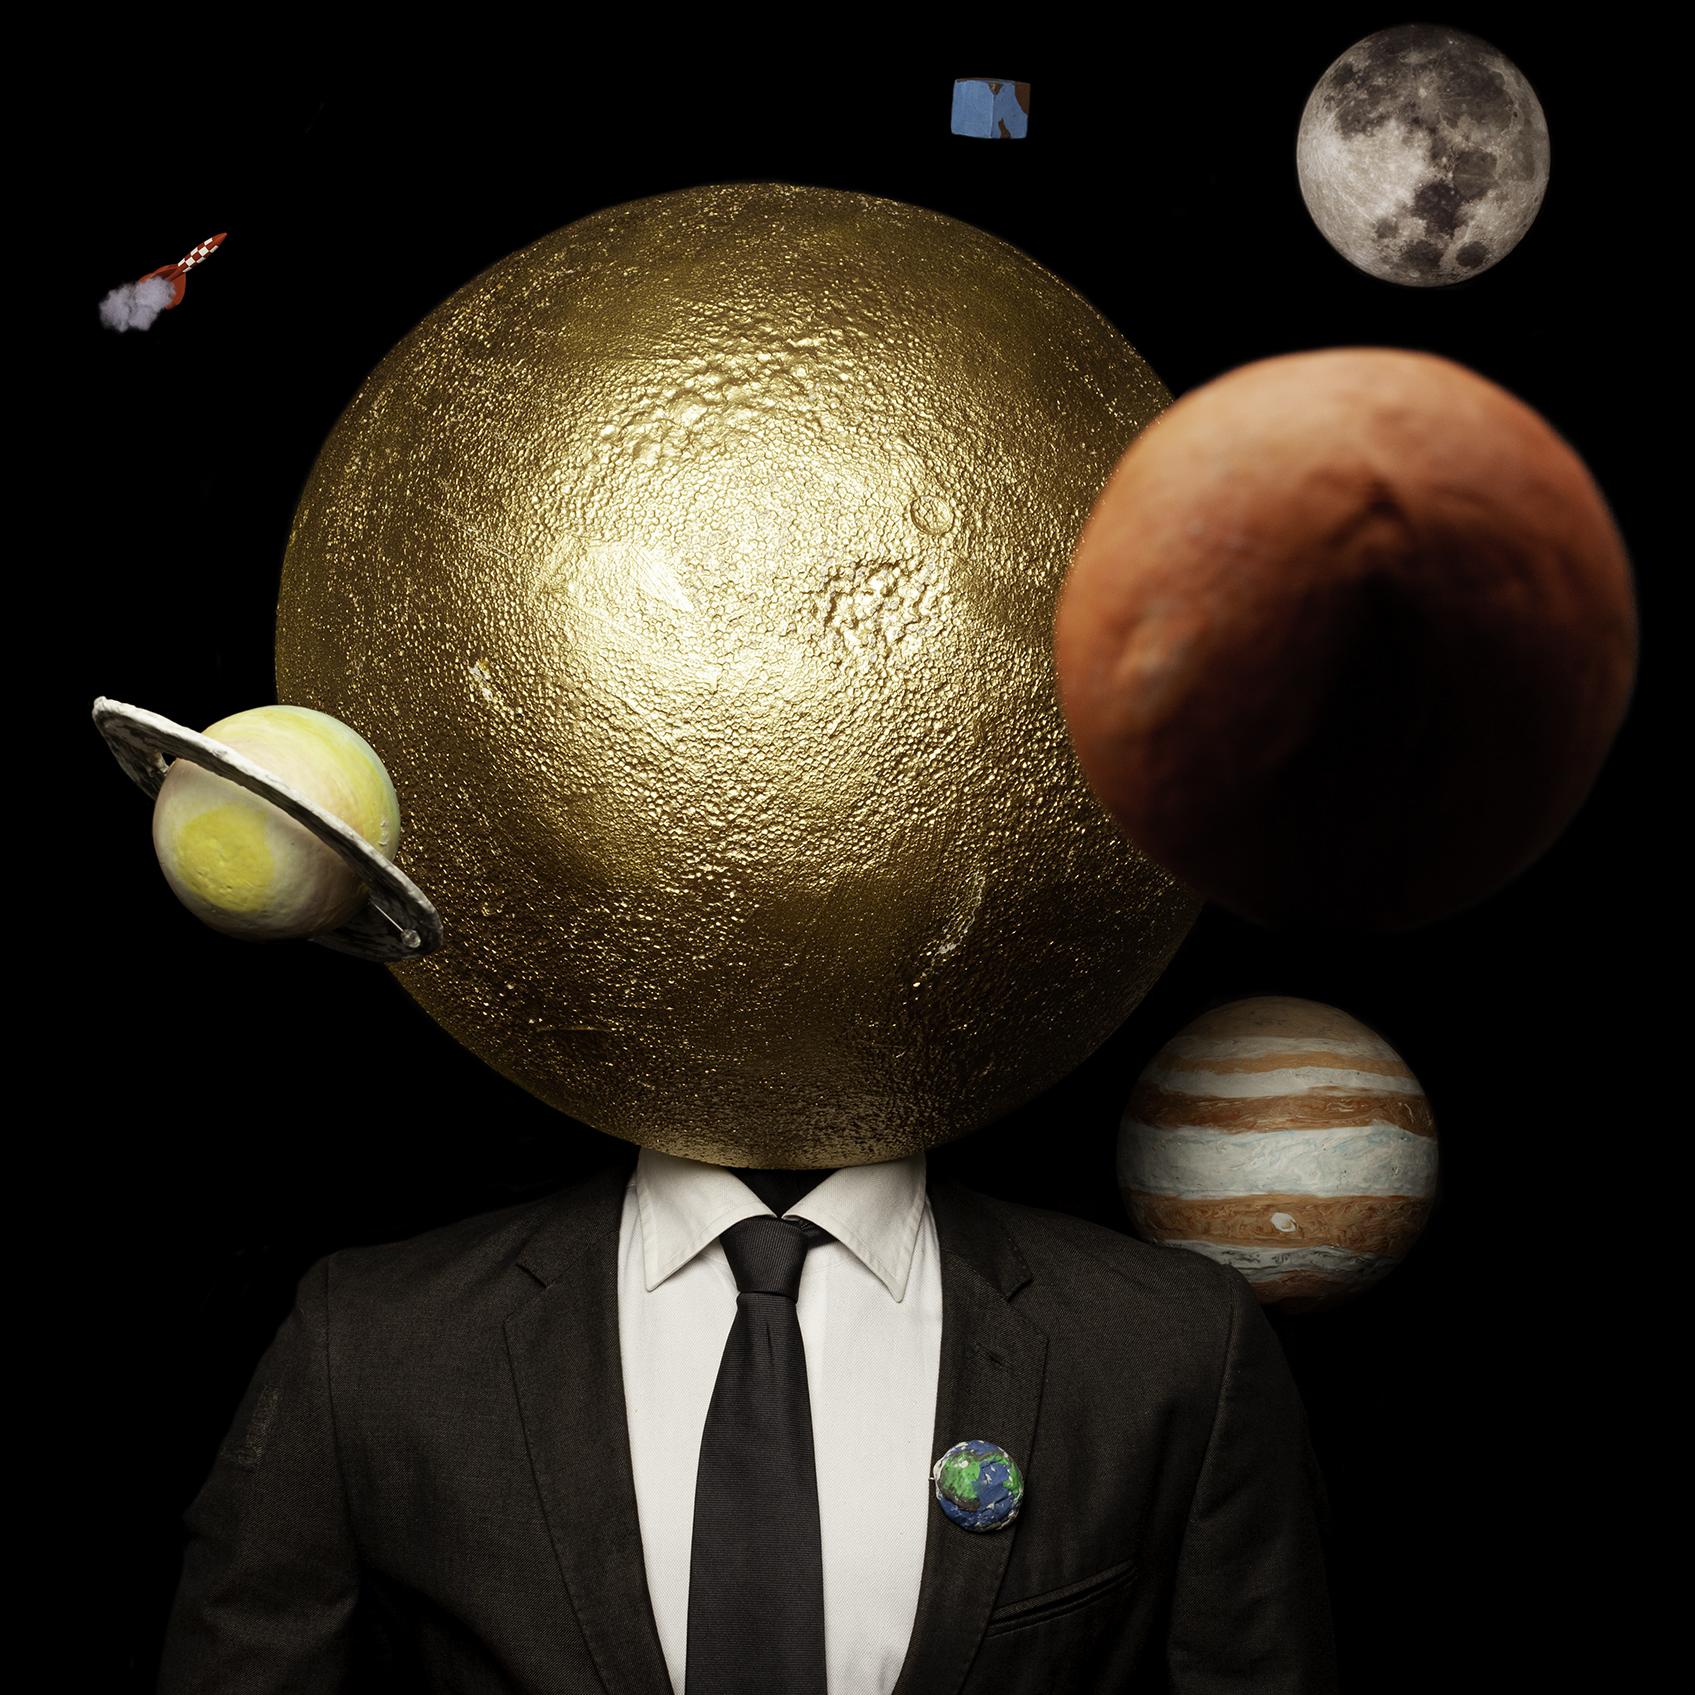 Planaomai: Copernicus